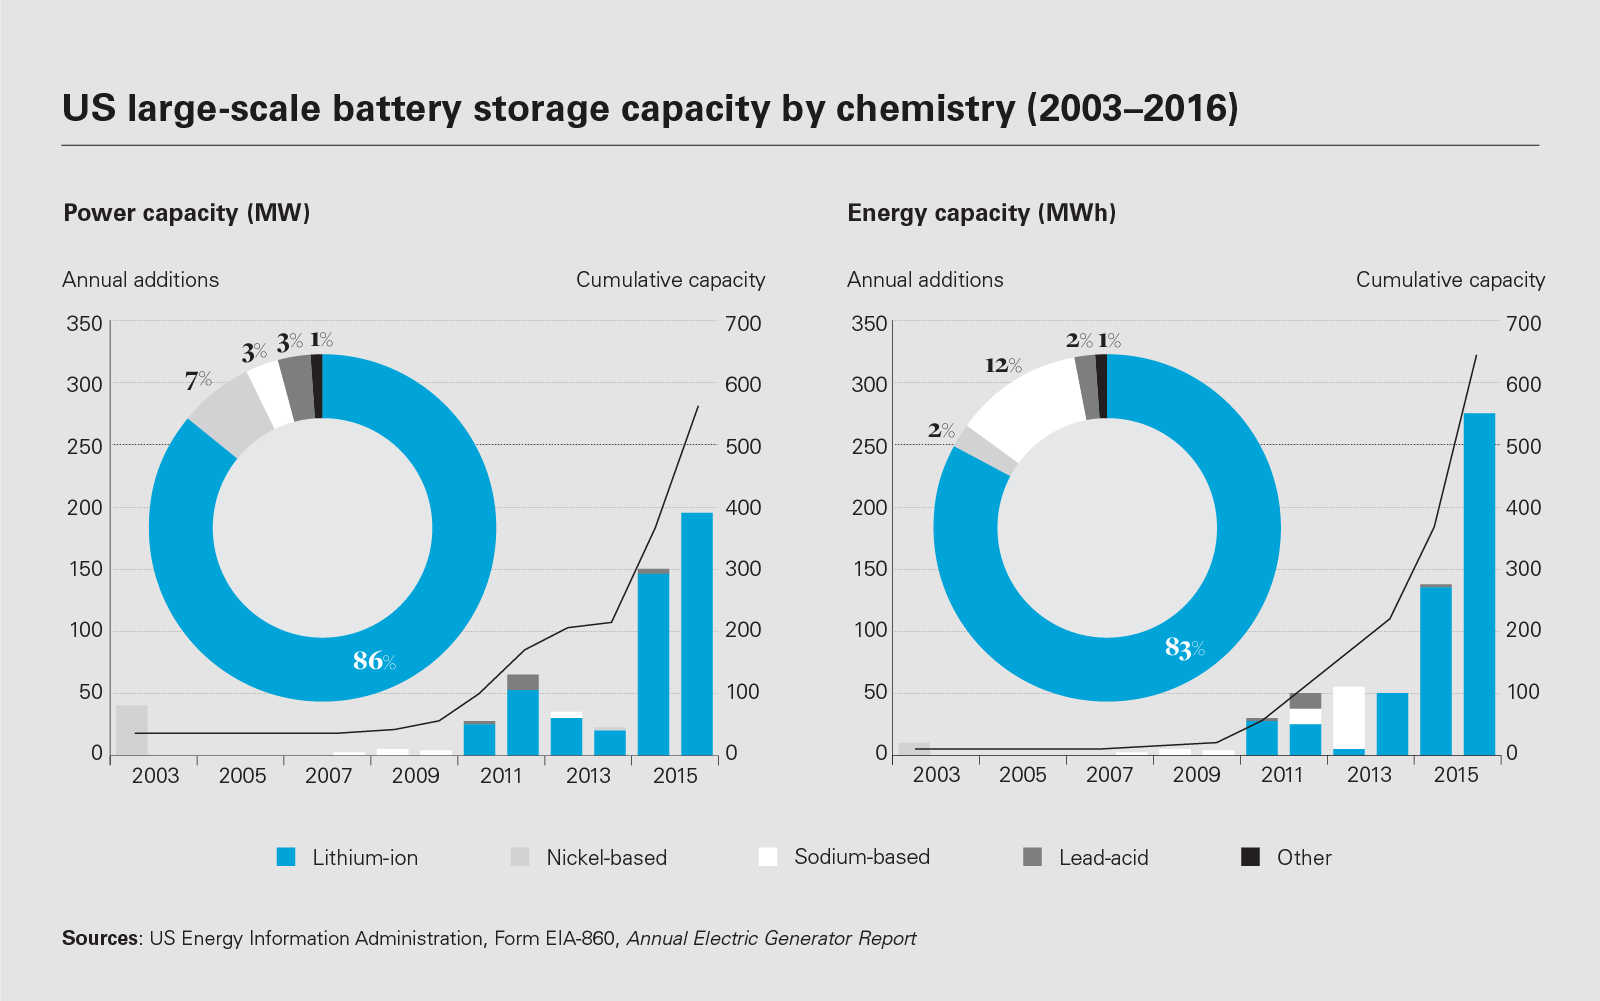 Energy_storage_LON0319065_Chart9_1600x900.png